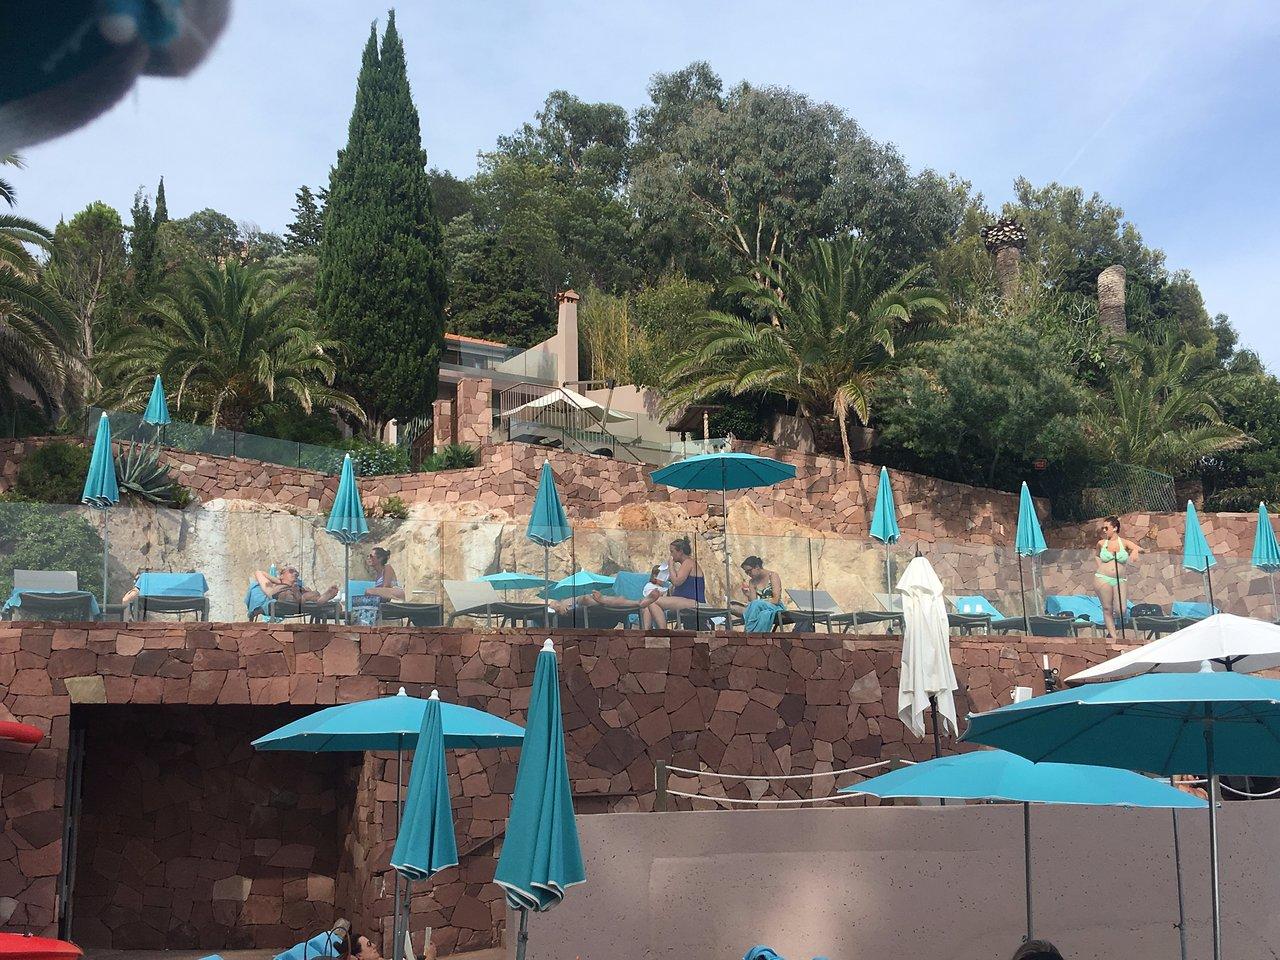 TIARA MIRAMAR BEACH HOTEL & SPA - Updated 2019 Prices